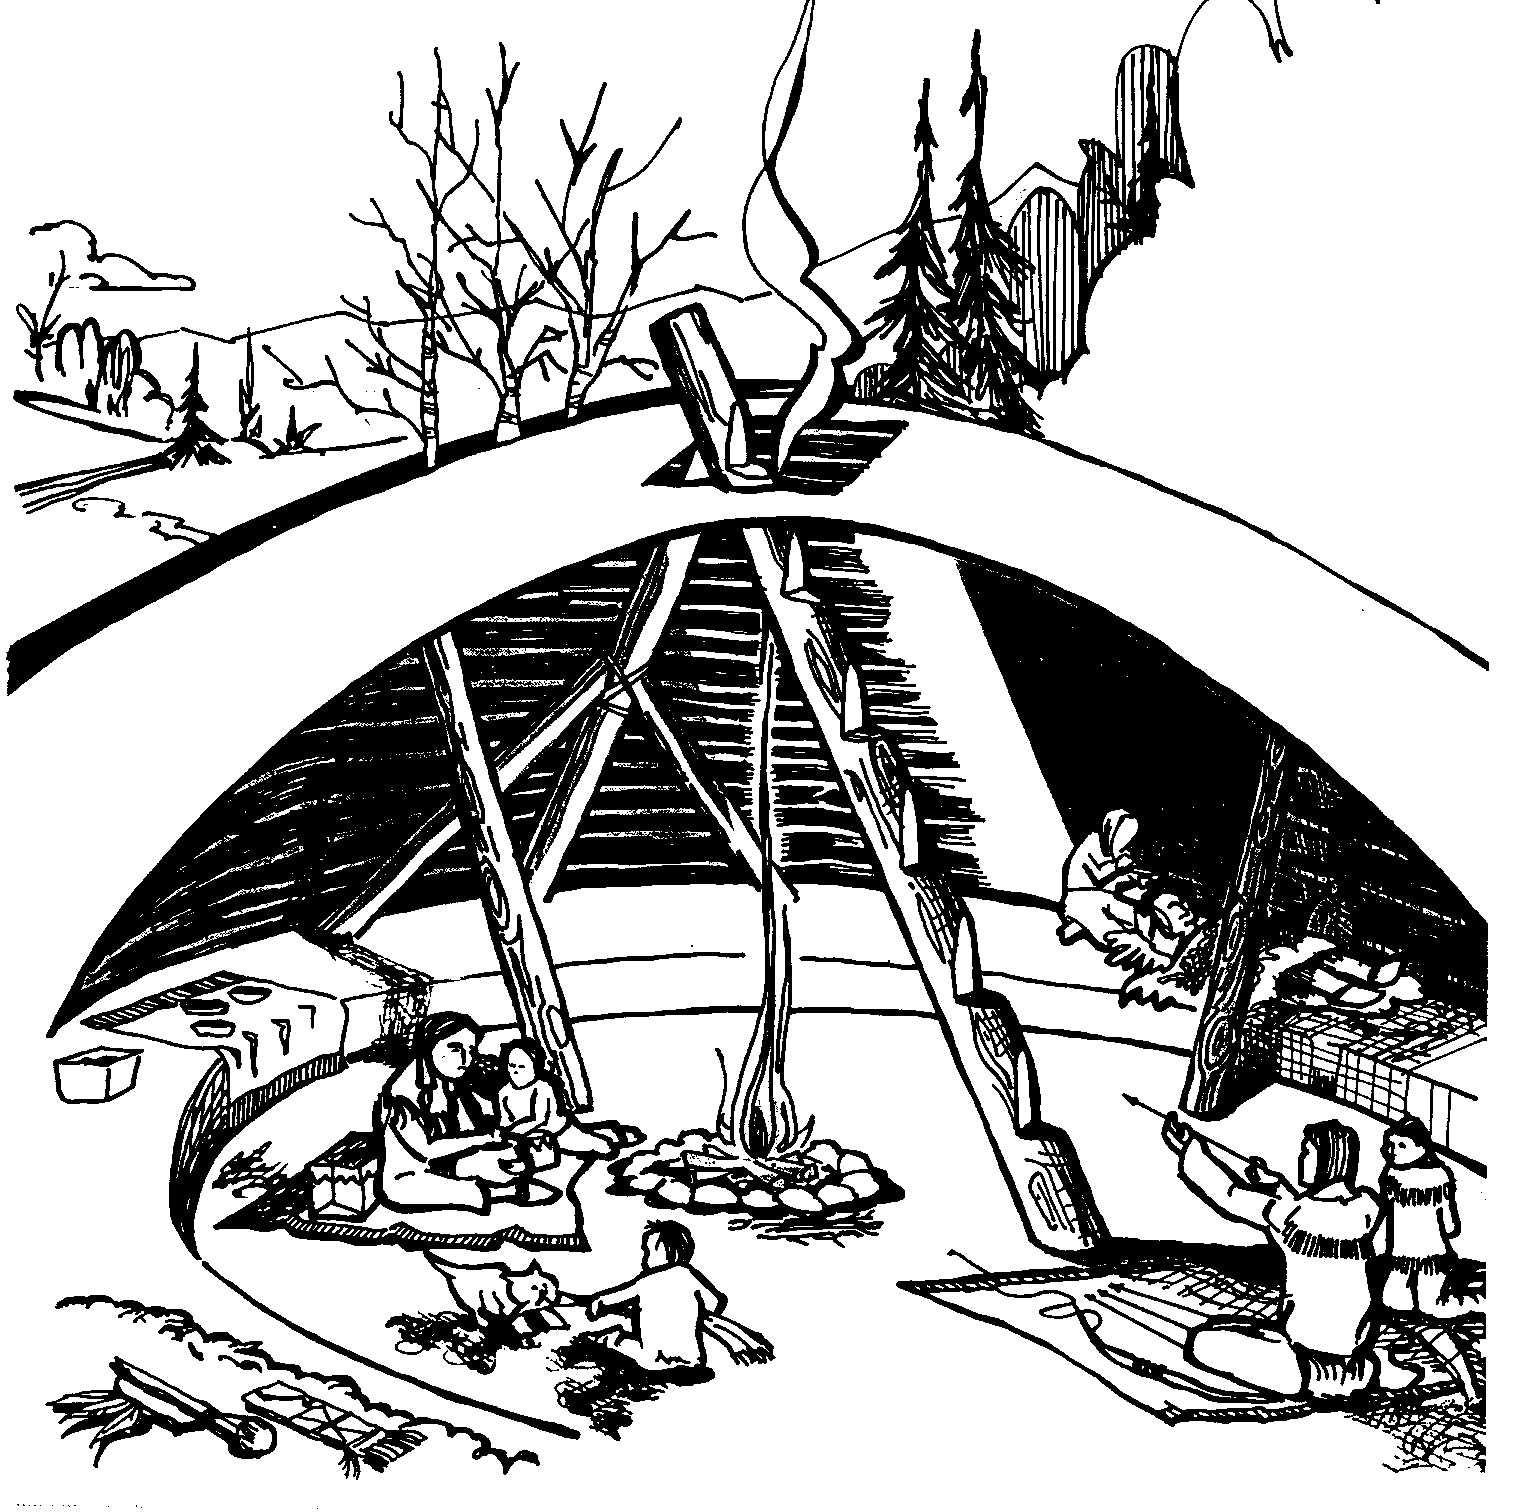 Indian Wilderness Survival Skills: Pithouse Illustration